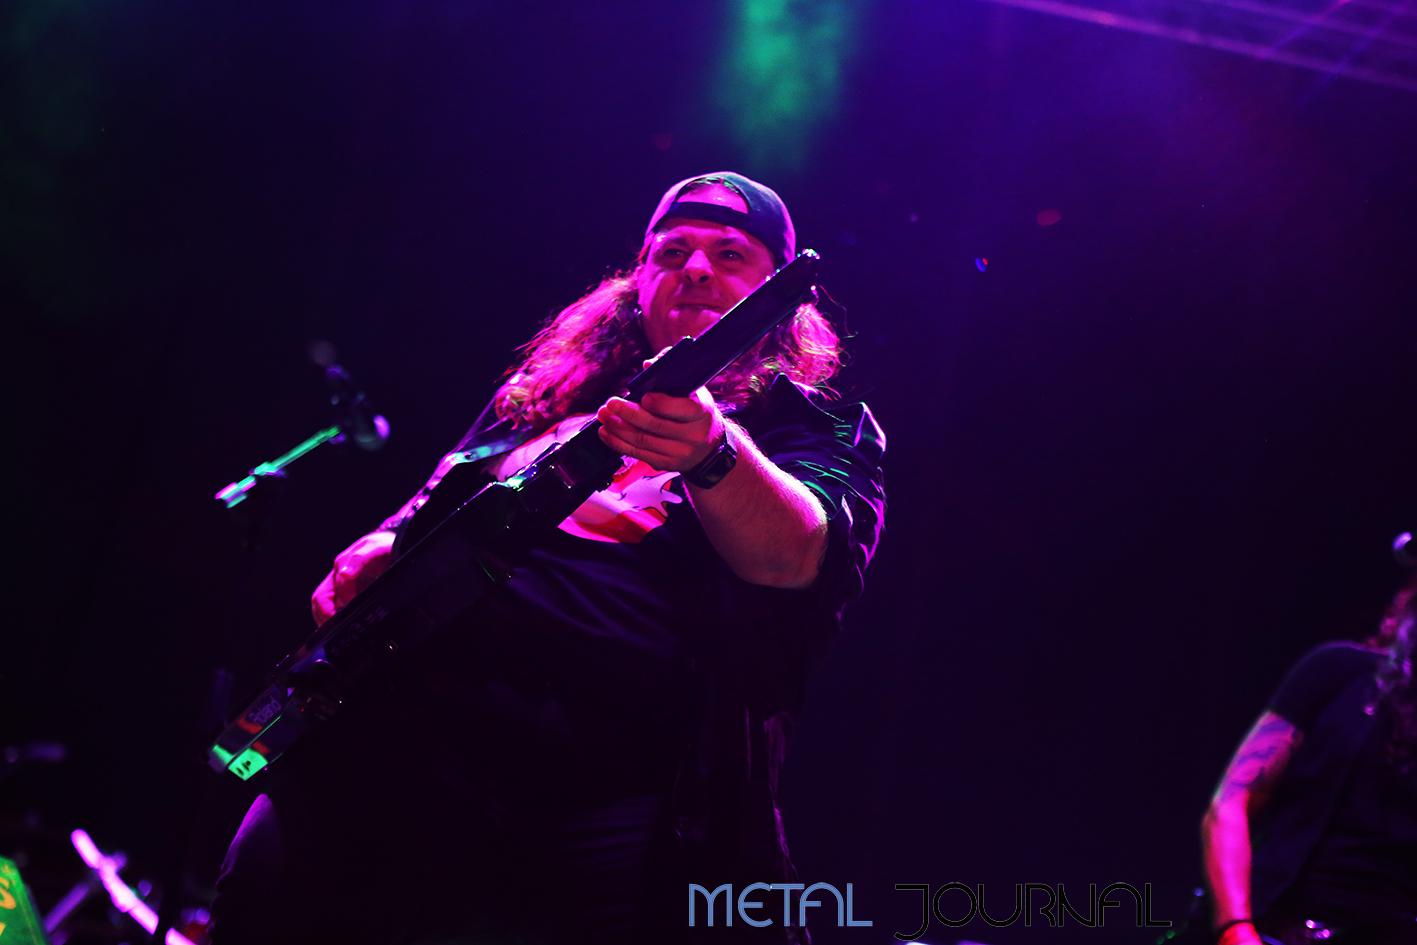 medina azahara - leyendas del rock 2019 metal journal pic 3